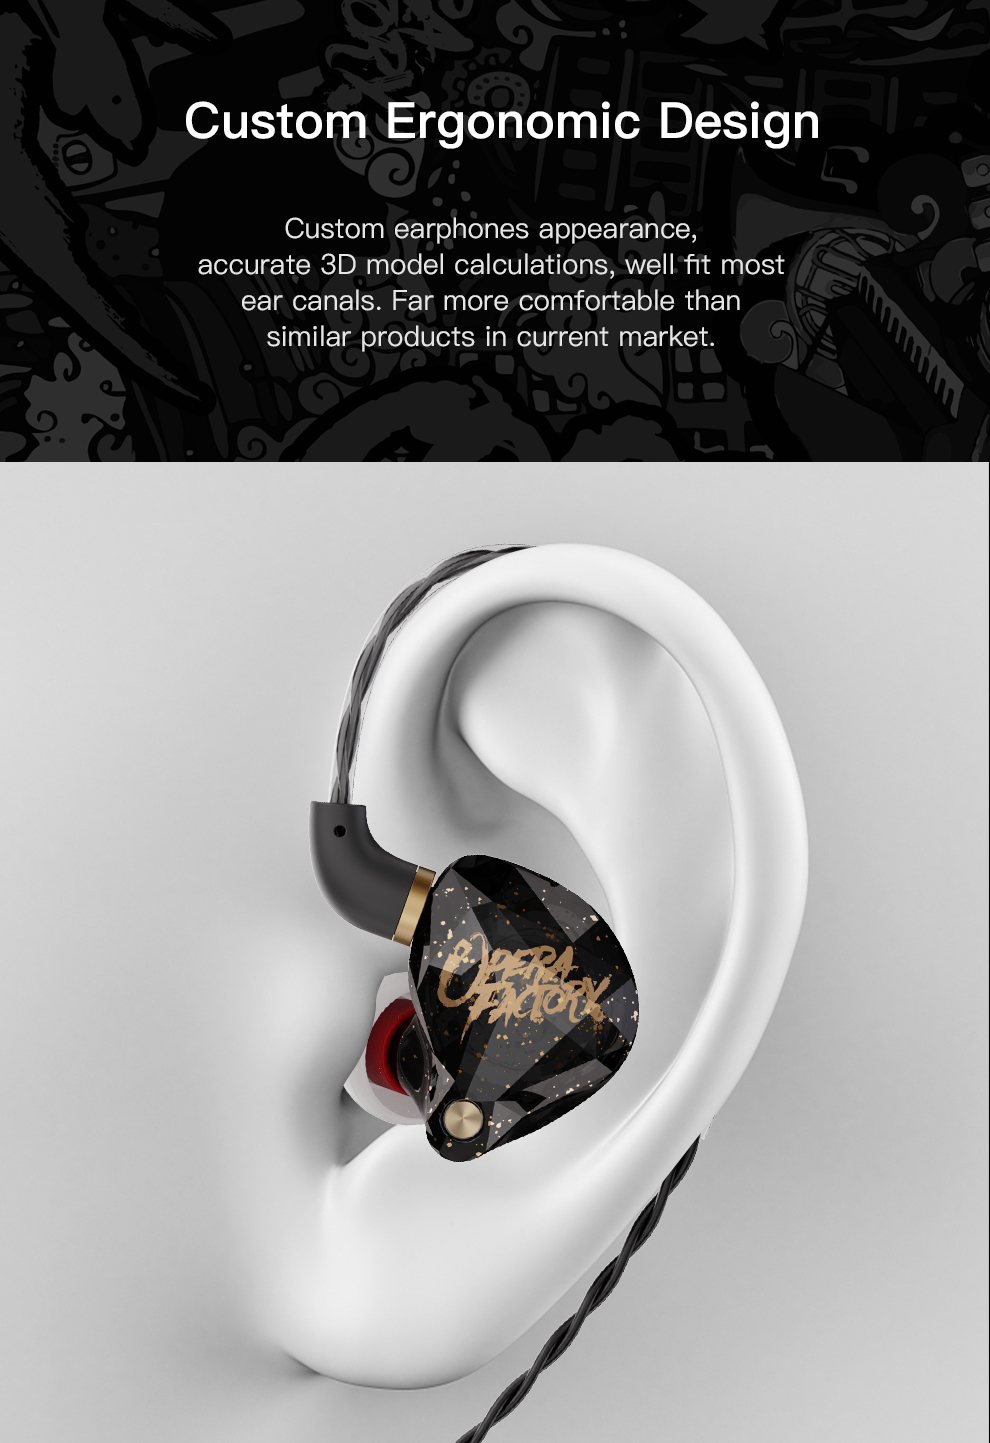 Novo operafactory os1 in-ear monitor dinâmico fone